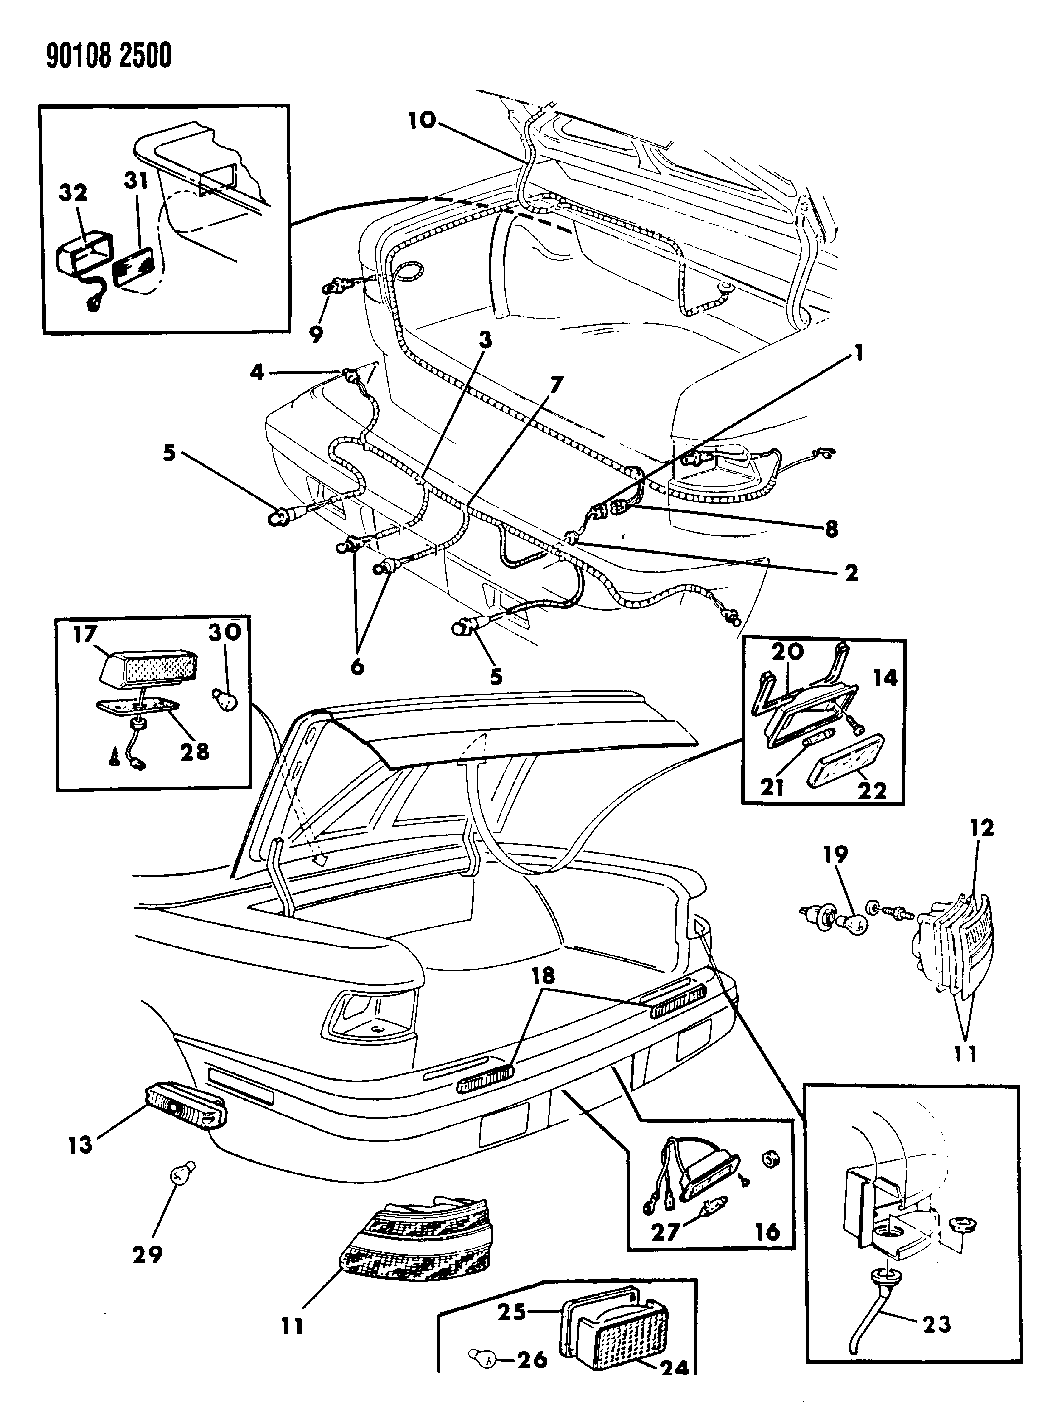 1990 chrysler tc wiring diagram - wiring diagram schematic nice-visit -  nice-visit.aliceviola.it  aliceviola.it